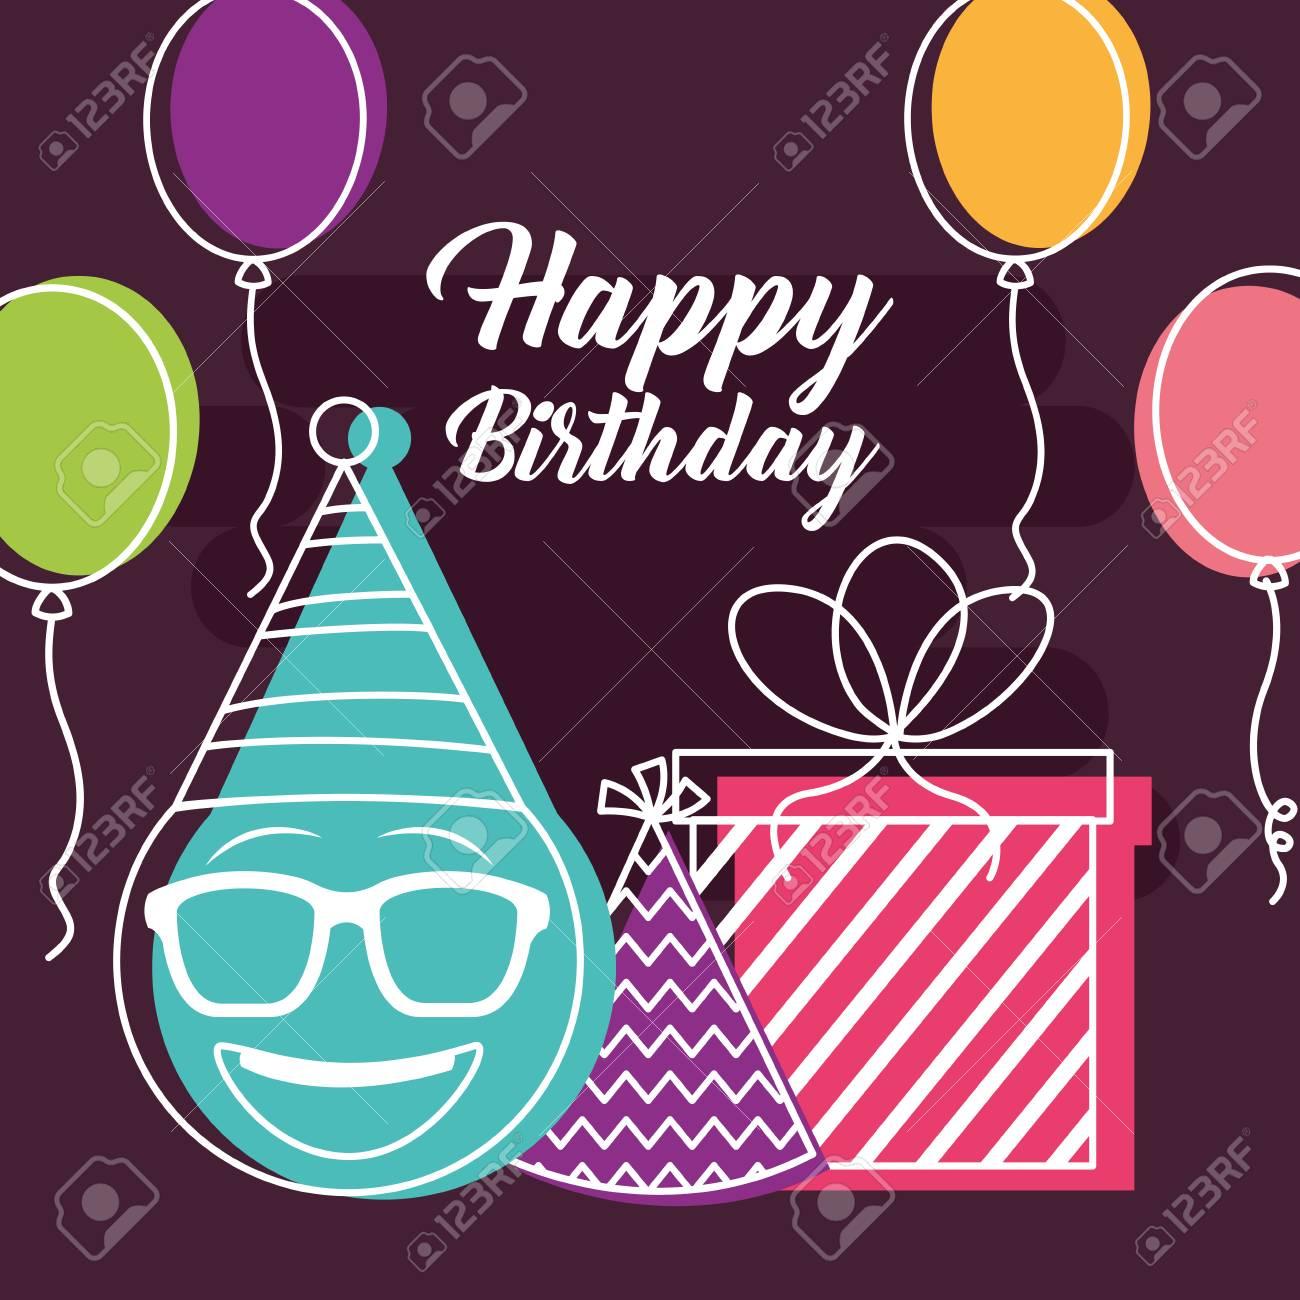 Happy Birthday Balloons Gift Box Emoji Using Glasses Party Hat Retro Style Vector Illustration Stock